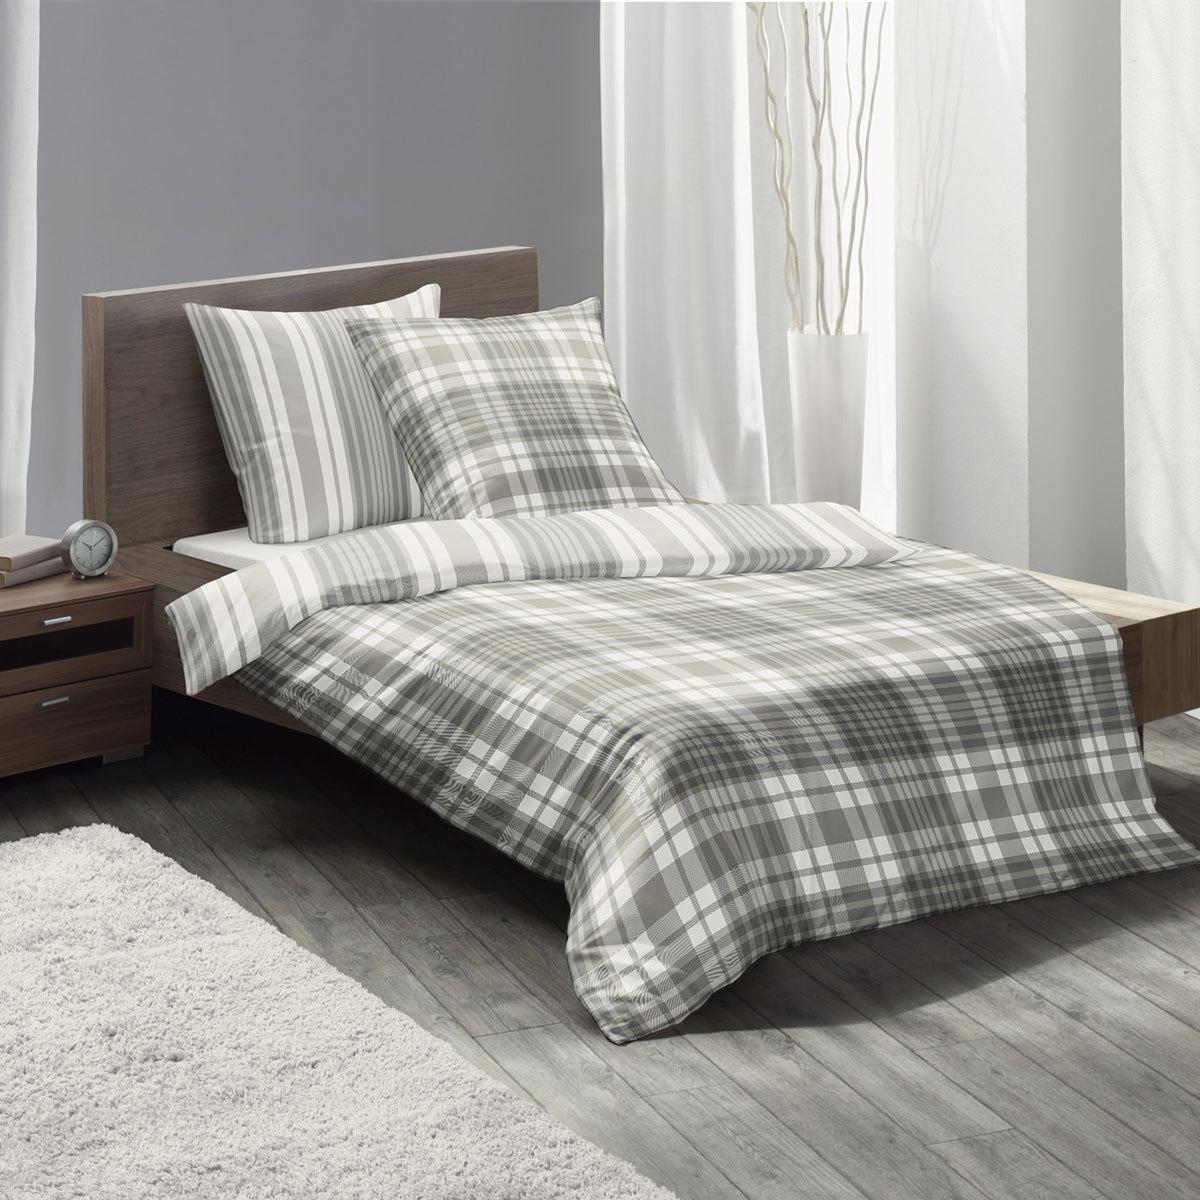 fleuresse edelflanell bettw sche 603743 07 natur g nstig online kaufen bei bettwaren shop. Black Bedroom Furniture Sets. Home Design Ideas